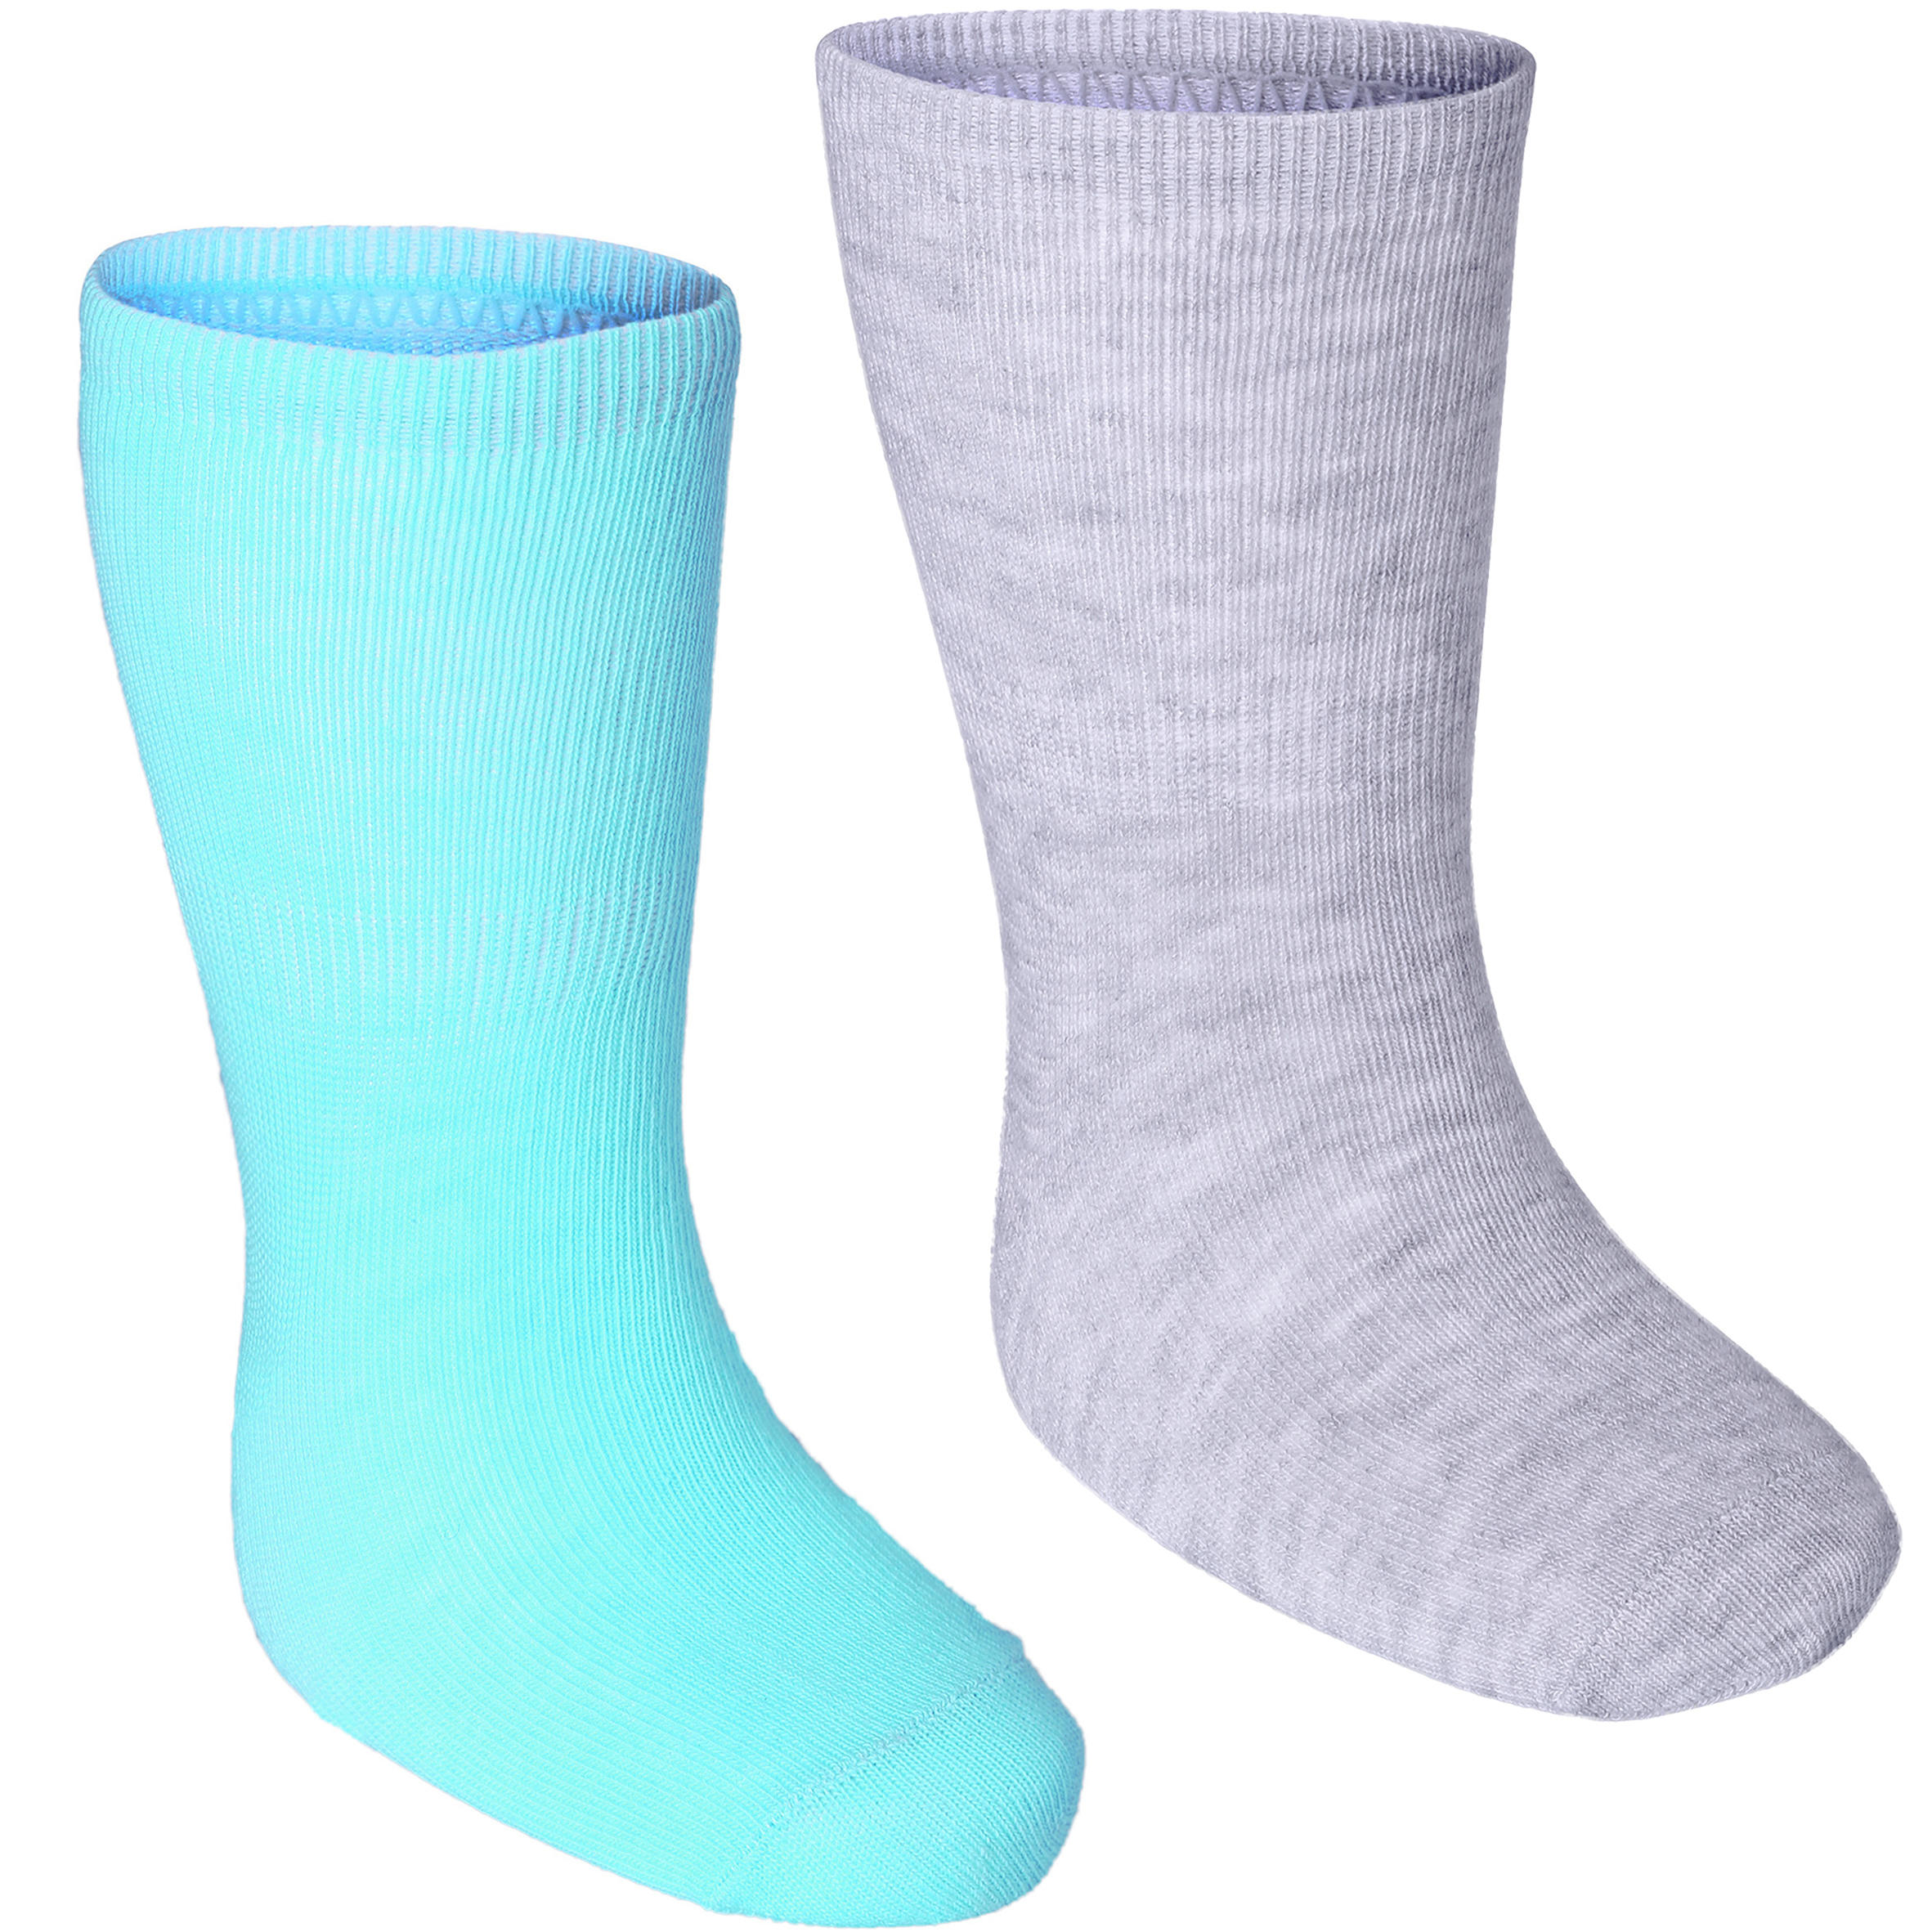 Paquete con 2 pares de calcetines de gimnasia infantil verde claro/gris jaspeado